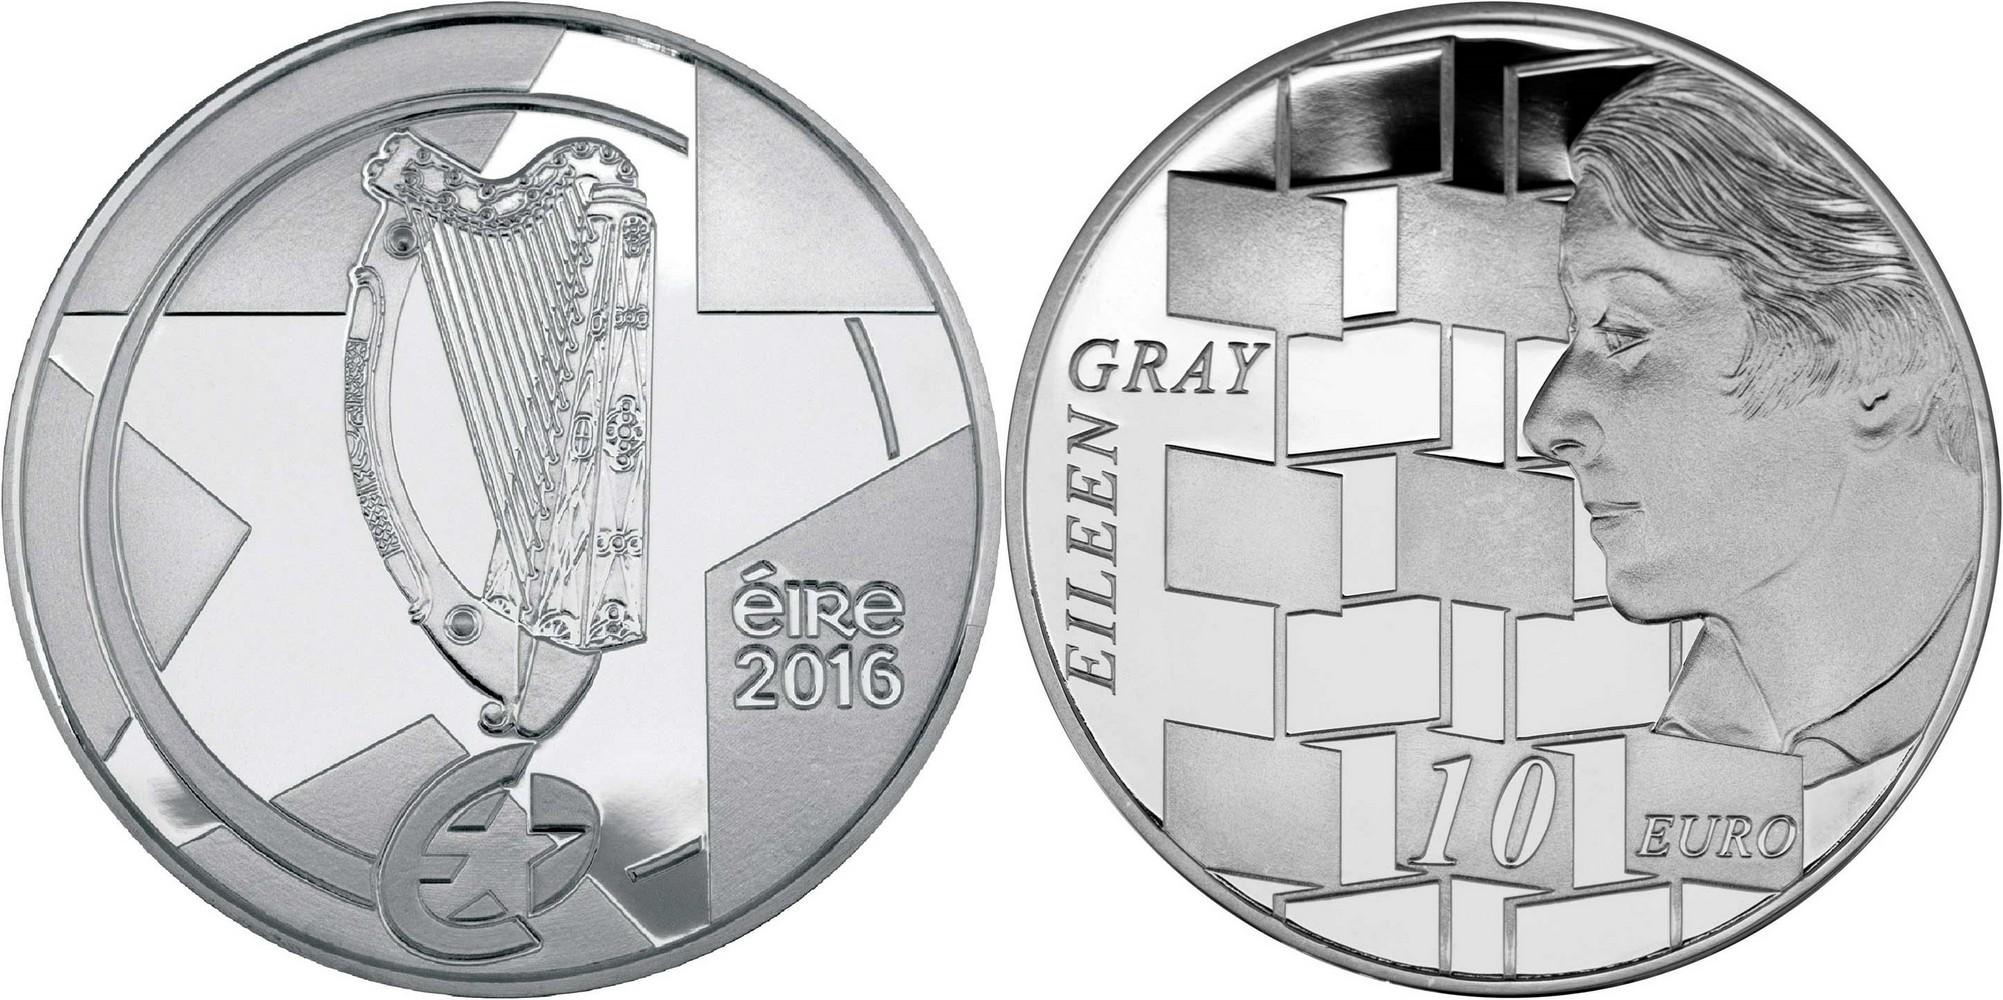 irlande 2016 eileen gray